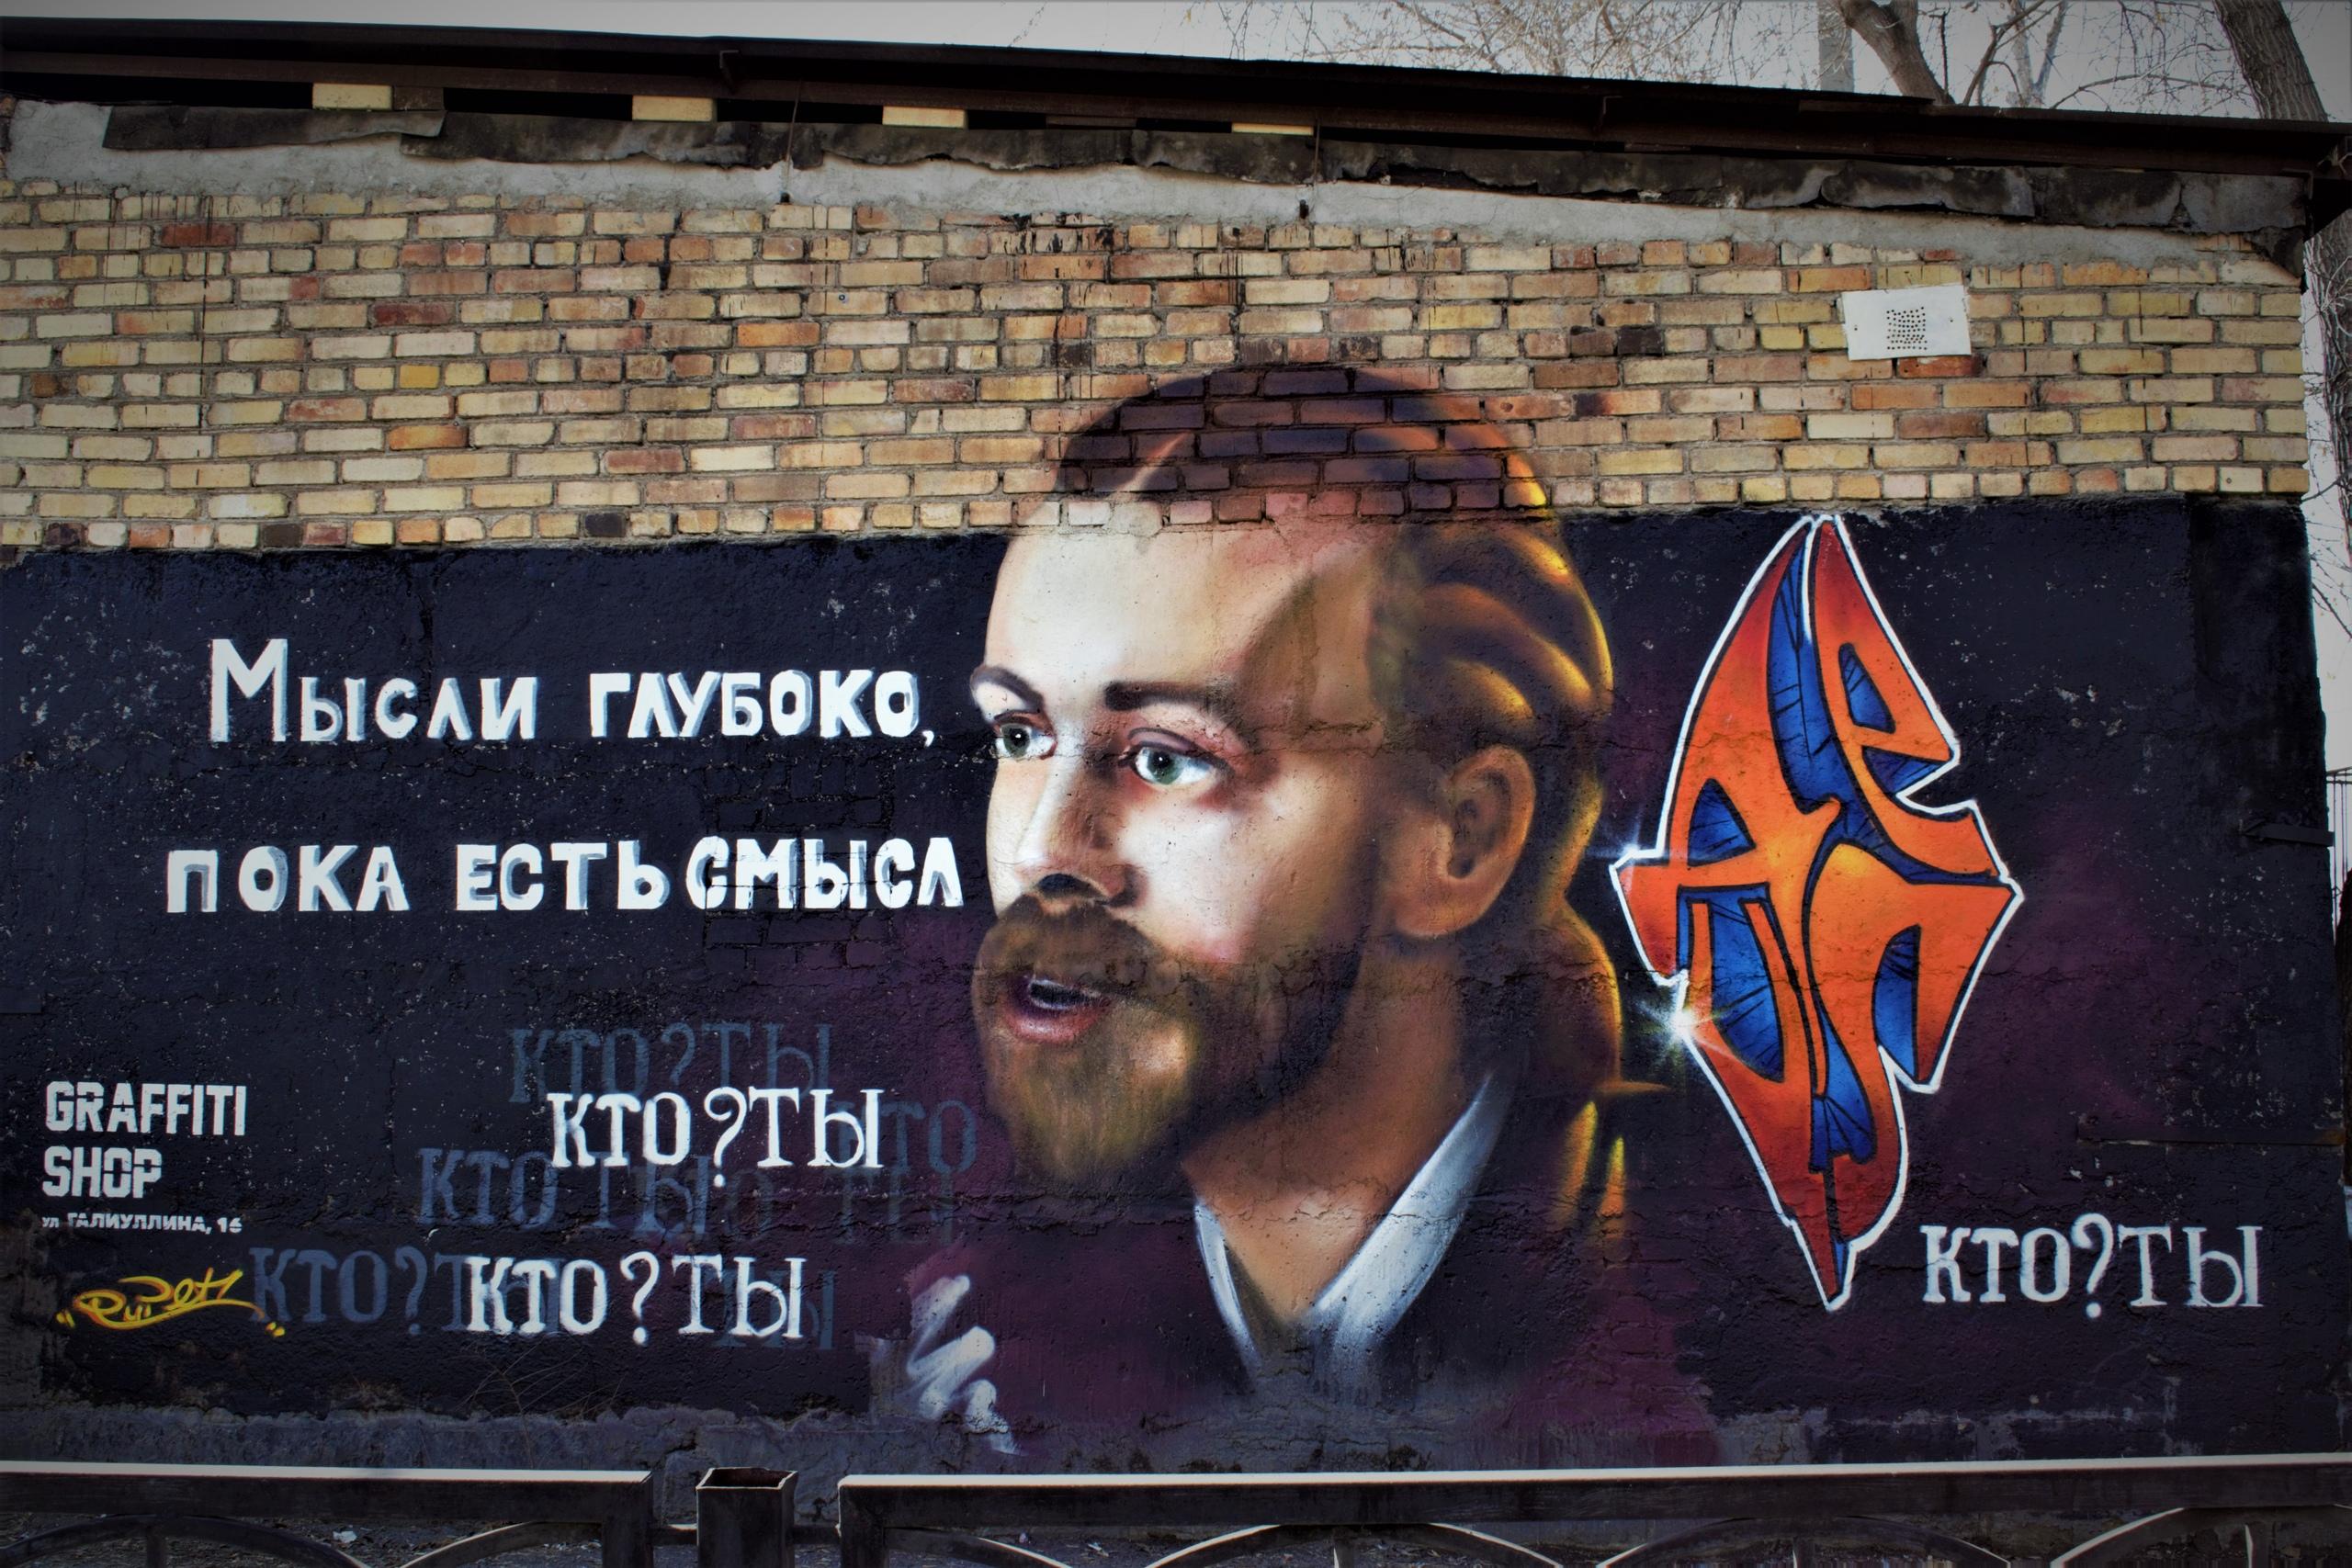 Легенда будет жить вечно. Кирилл Толмацкий он же Le Truk aka Juzeppe Jostko.